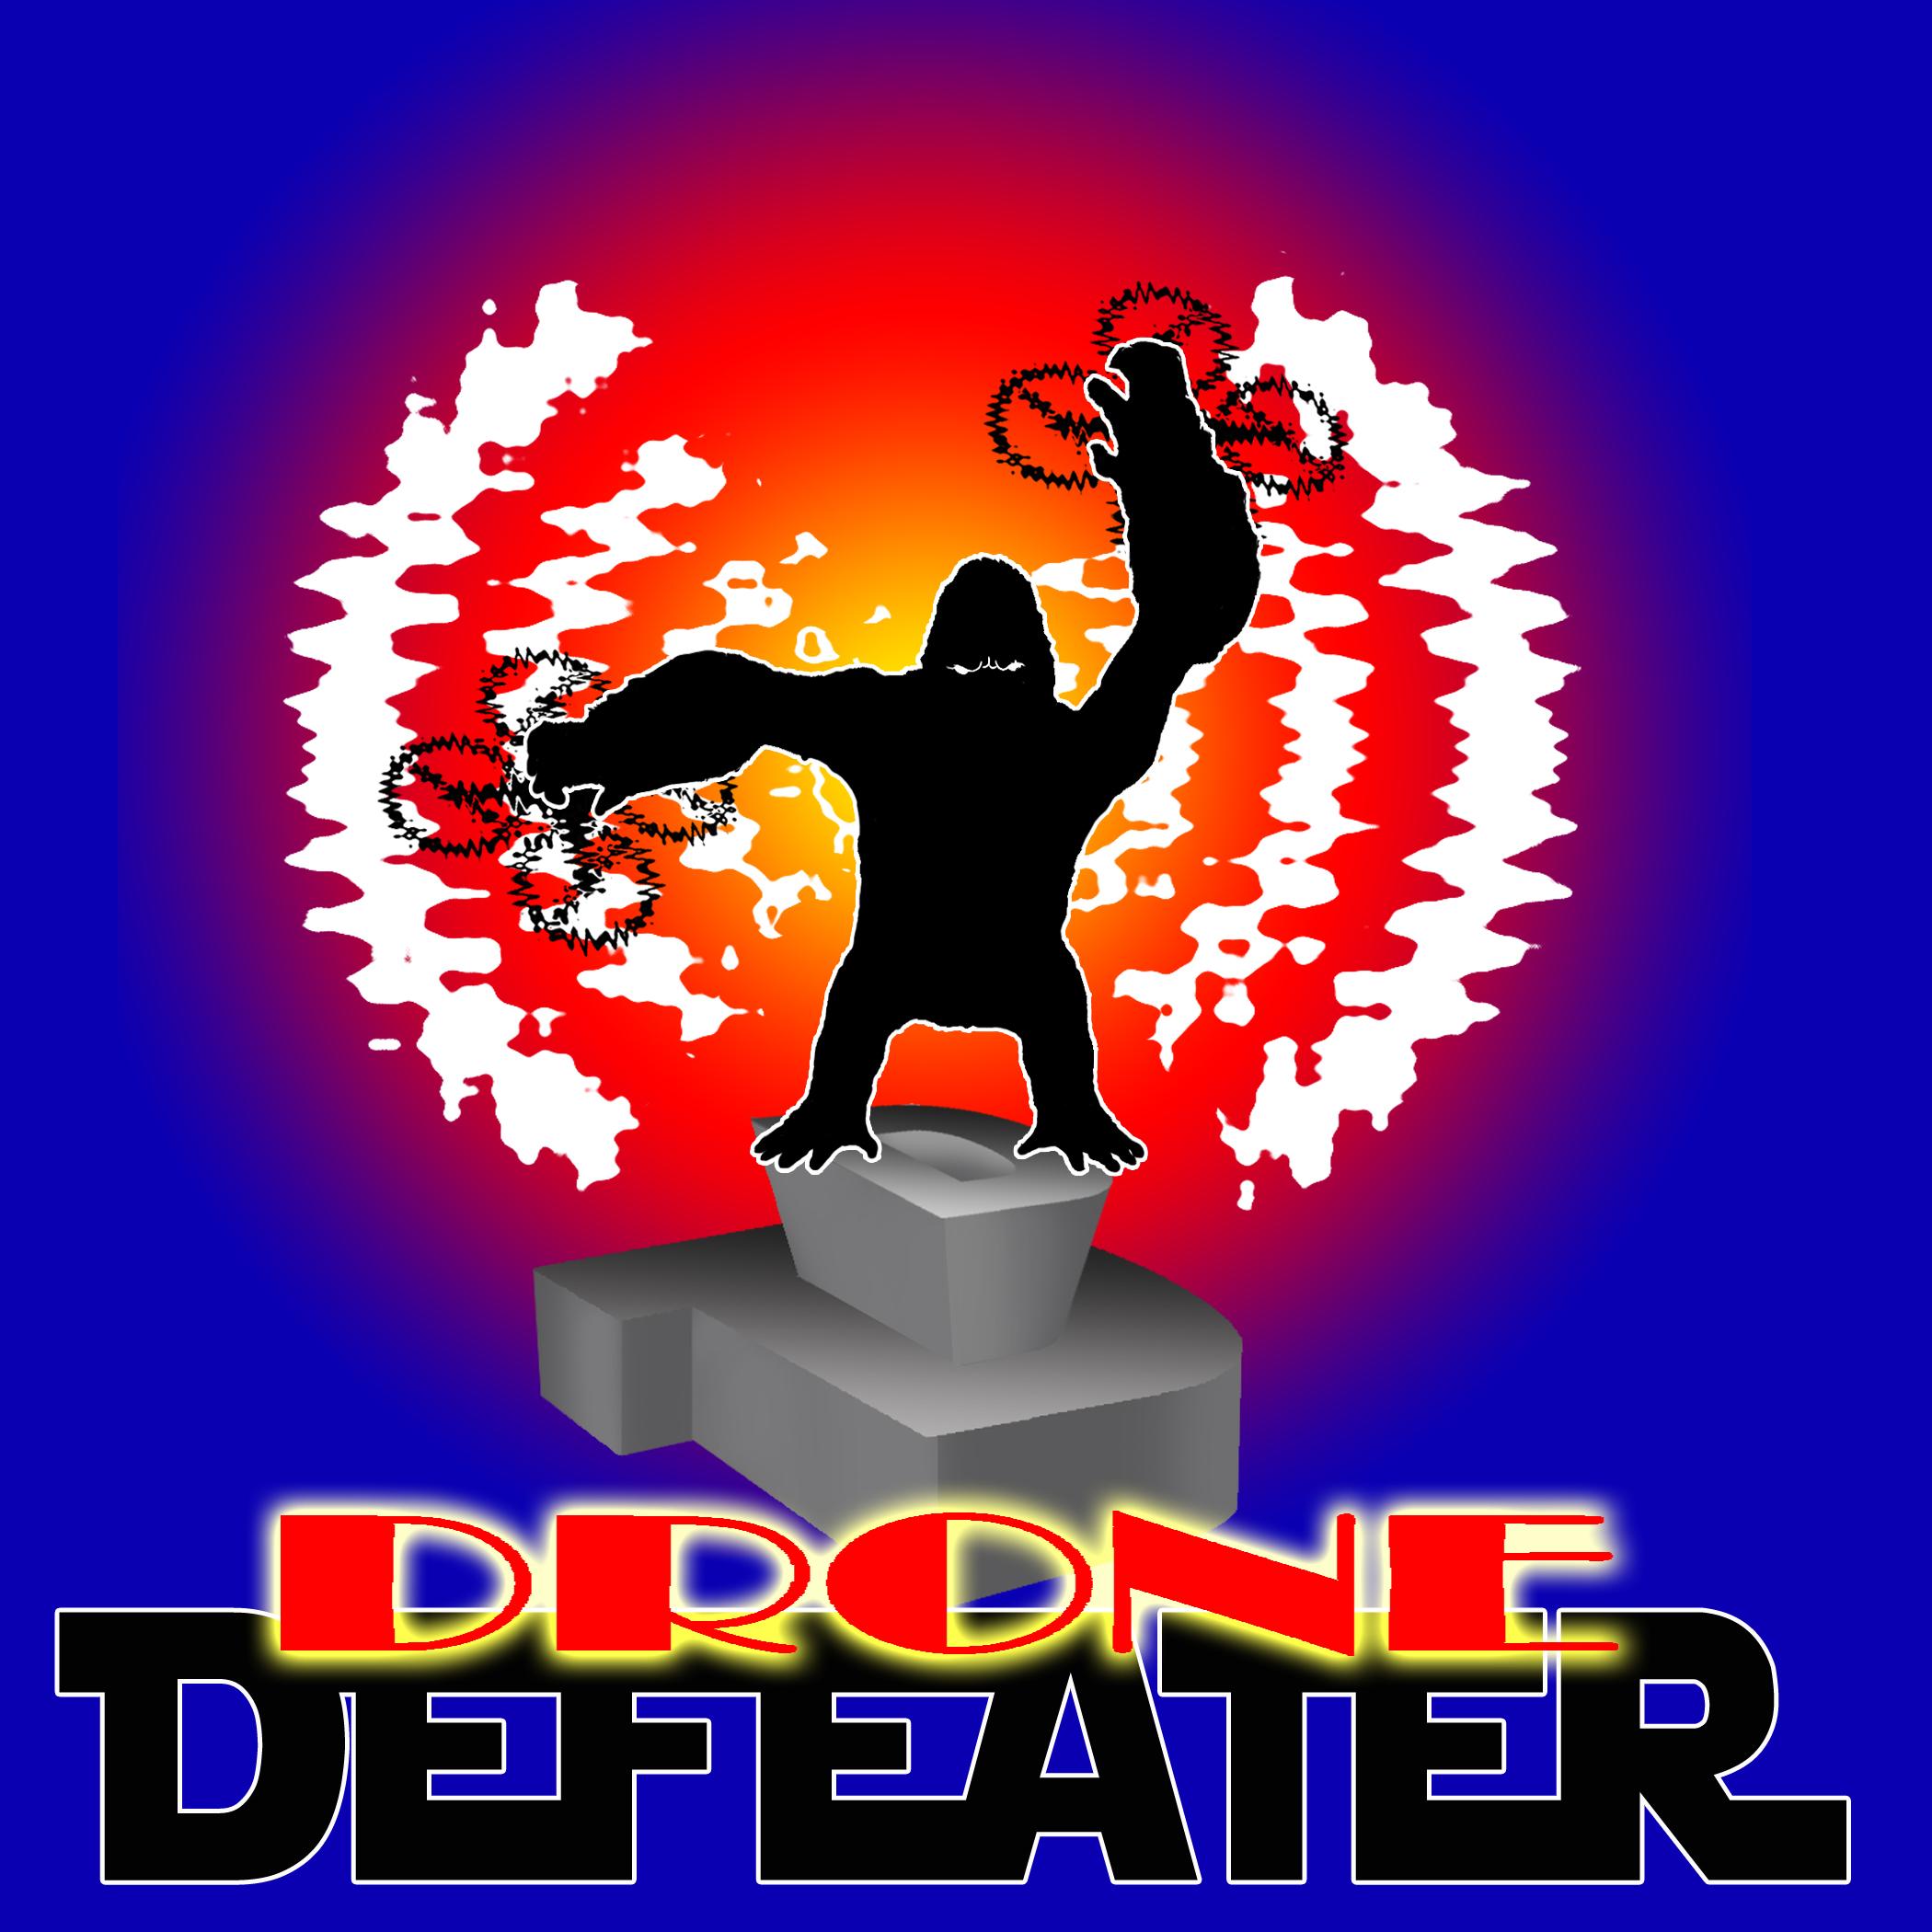 Logo Design by Kitz Malinao - Entry No. 71 in the Logo Design Contest Artistic Logo Design for Drone Defeater.